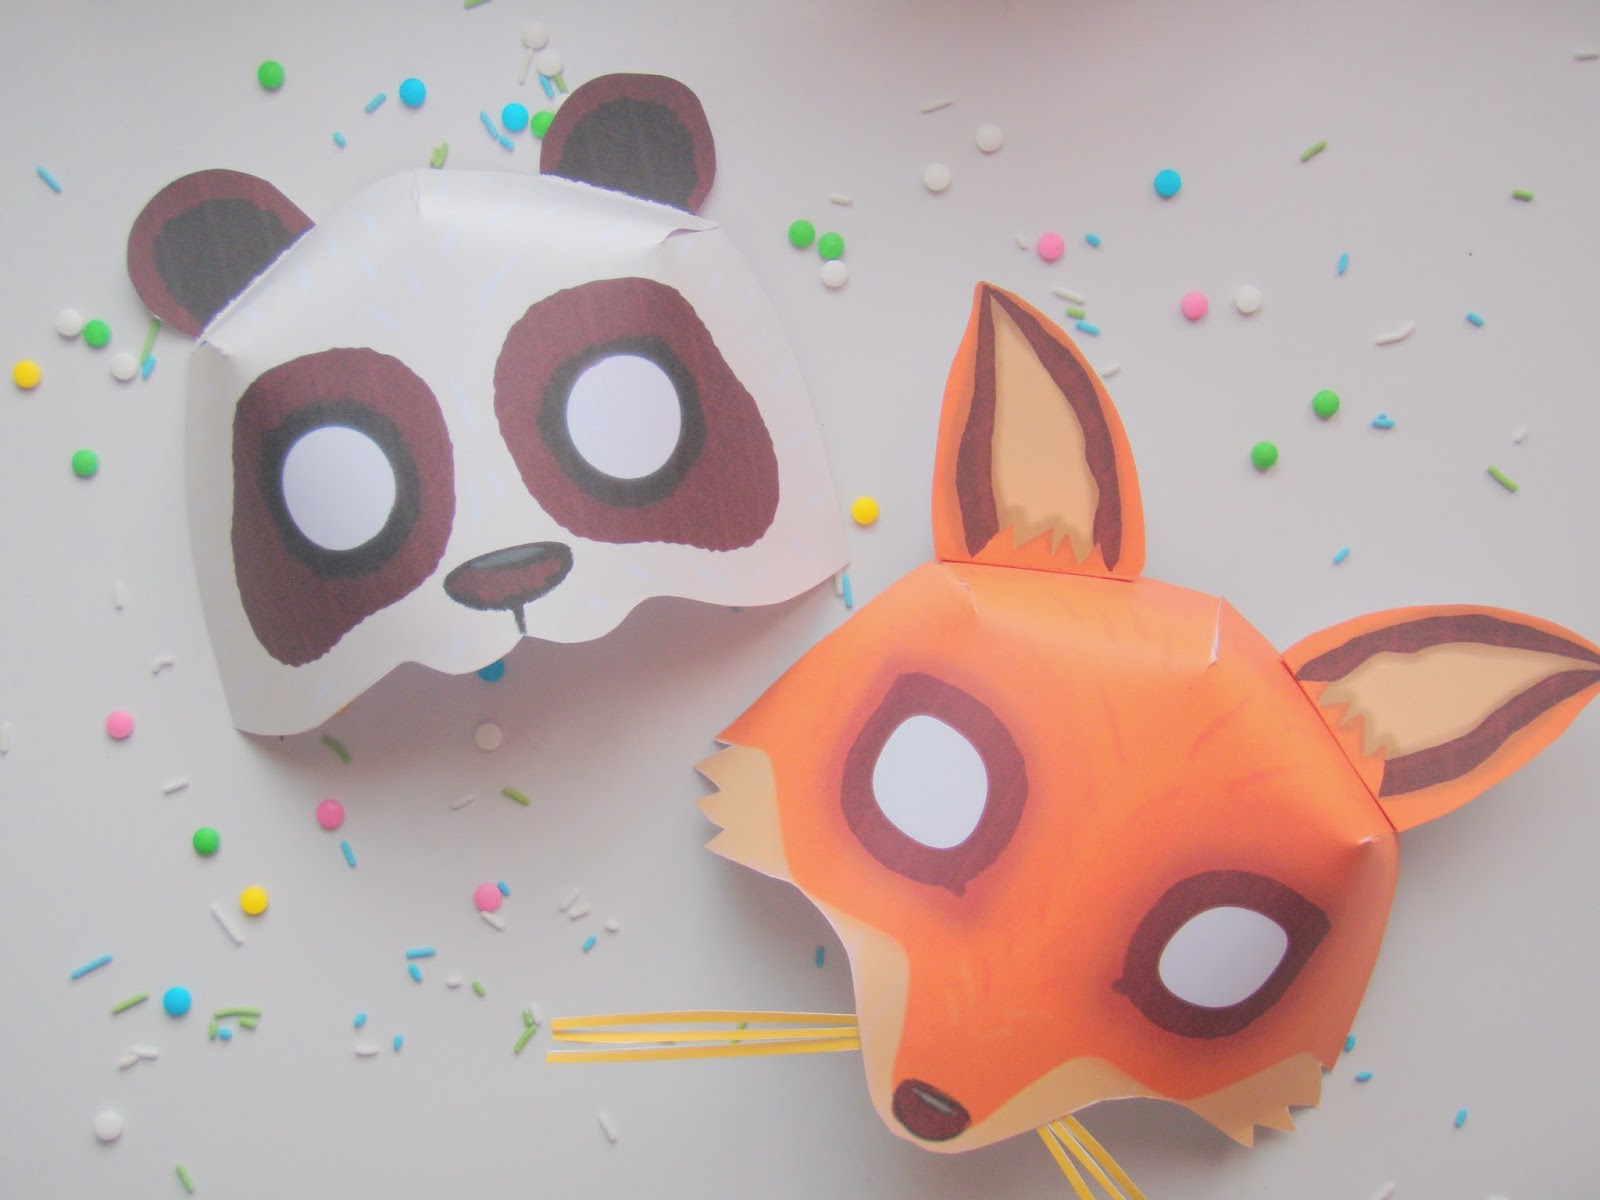 De jolis masques imprimer pour mardi gras - Masque de renard a imprimer ...